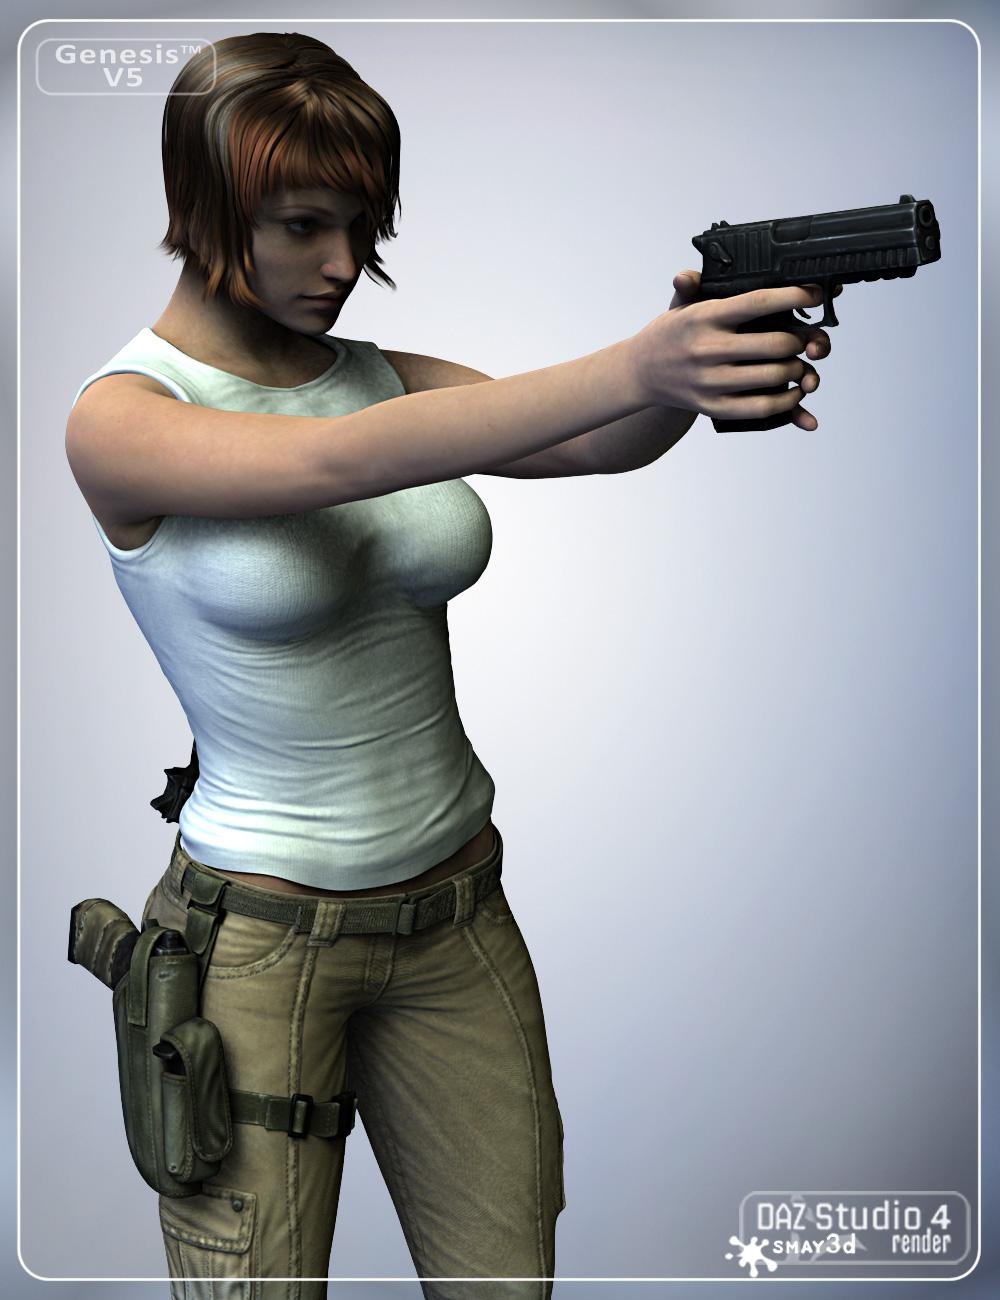 Stalker Girl Guns for Genesis by: smay, 3D Models by Daz 3D